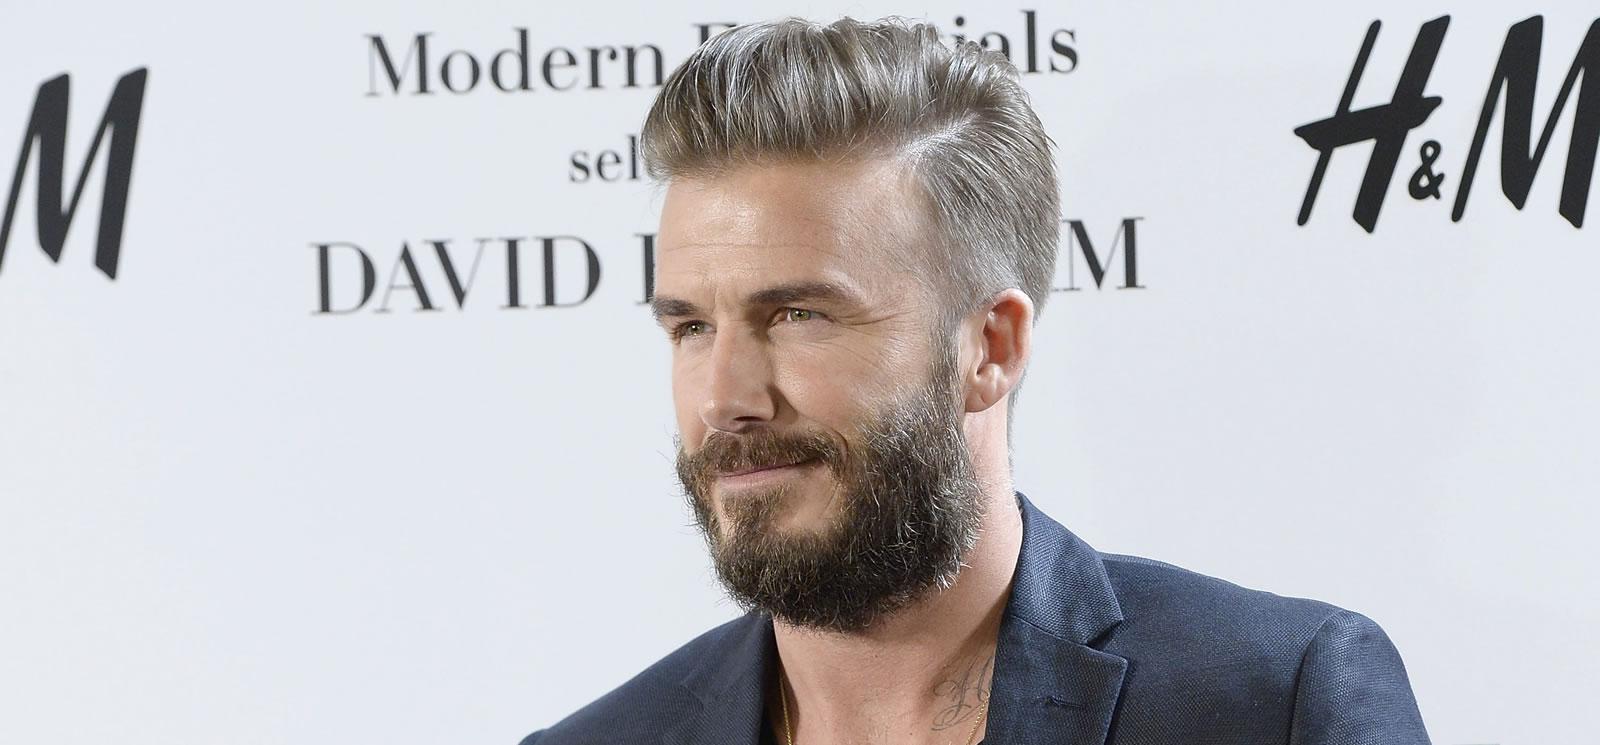 Bien-aimé Tendenze moda-capelli per l'uomo JP05